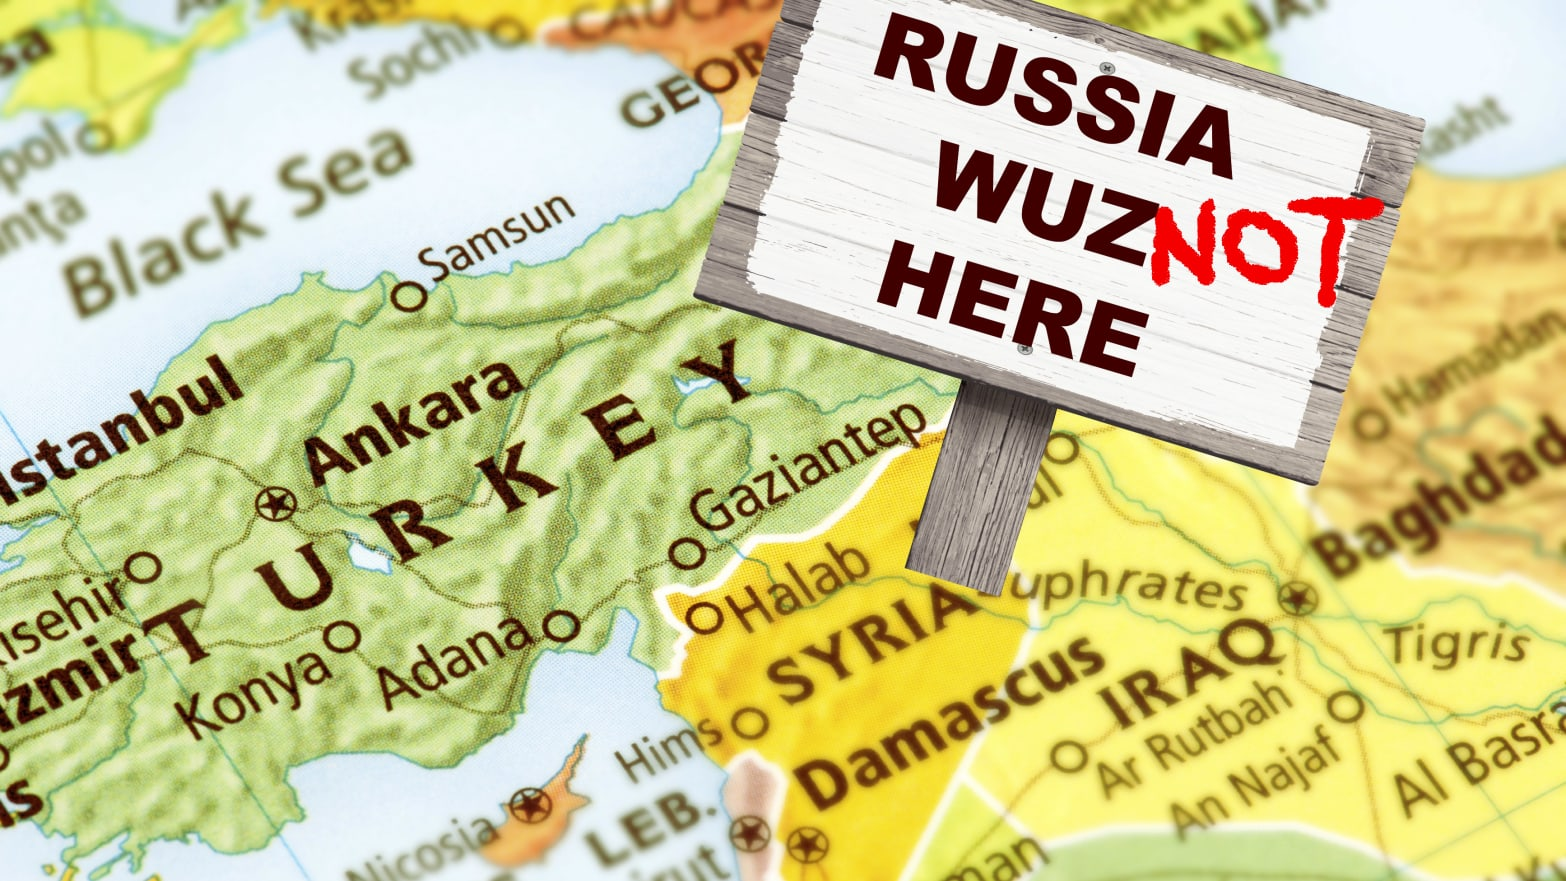 Kremlin Falls for Its Own Fake Satellite Imagery